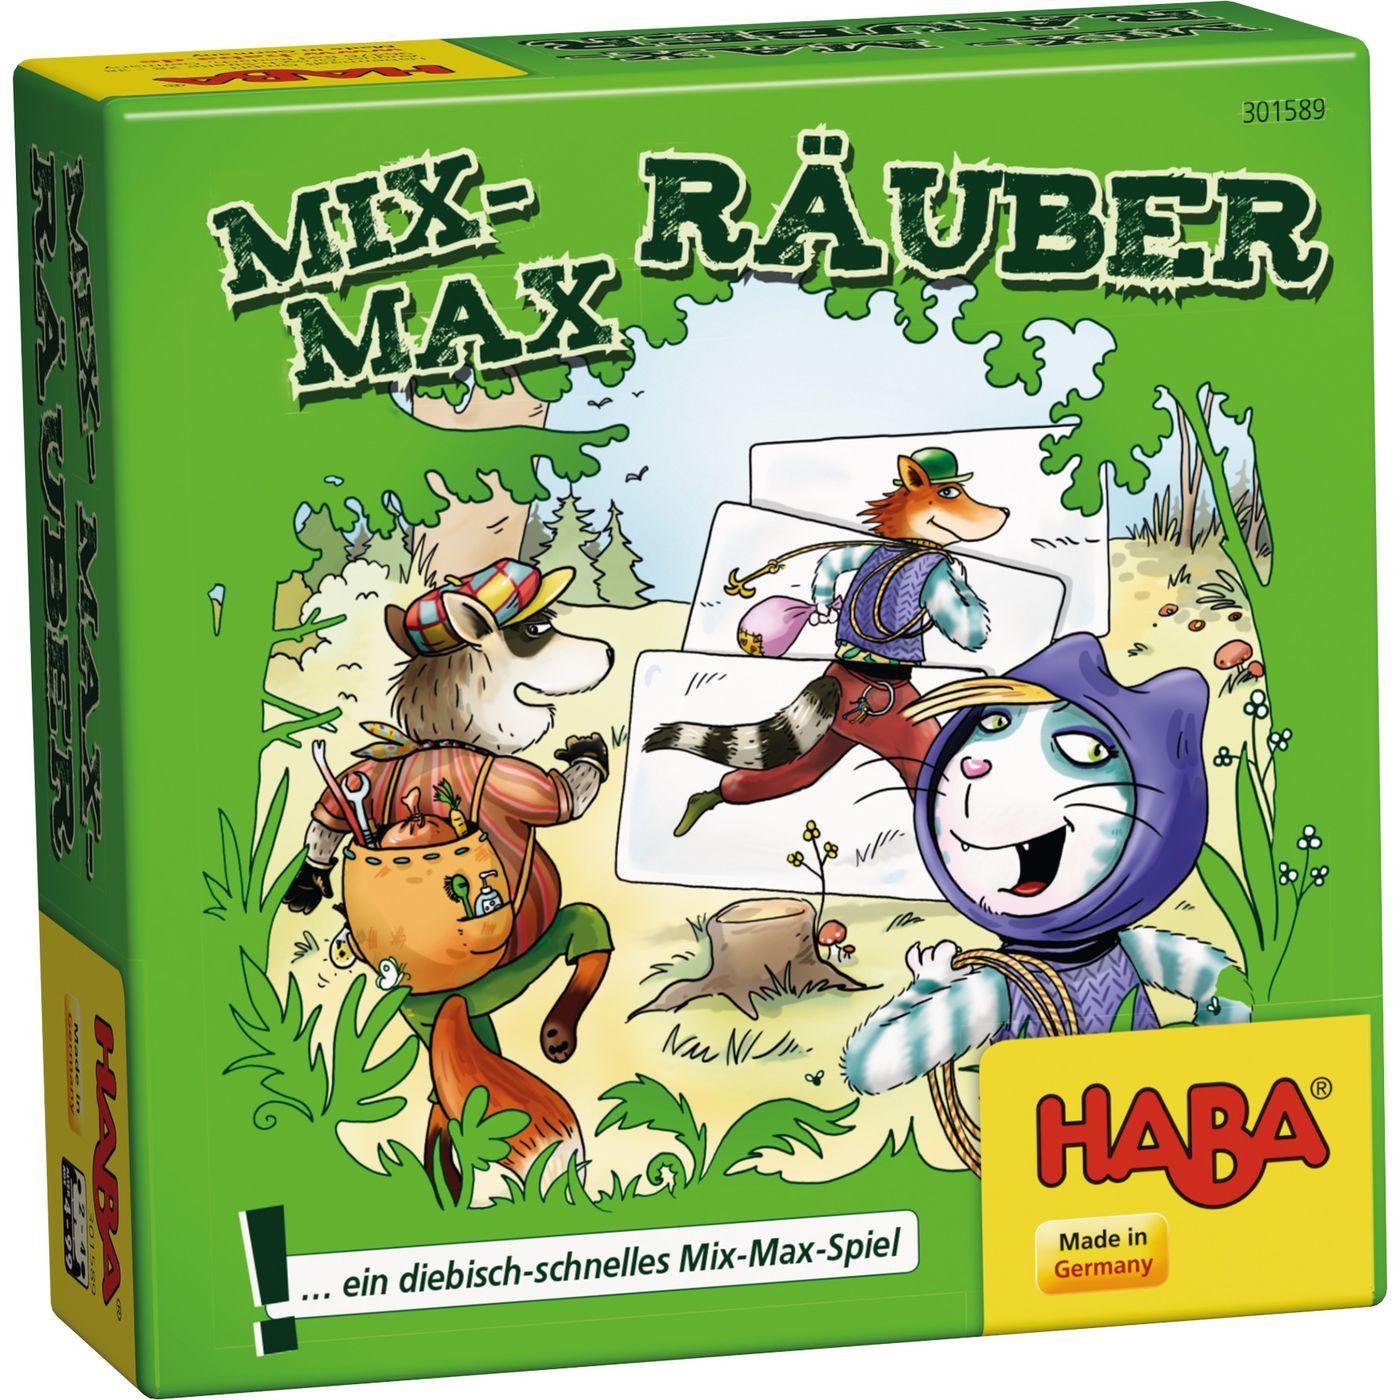 Mix-Max-разбойники HABA 301589